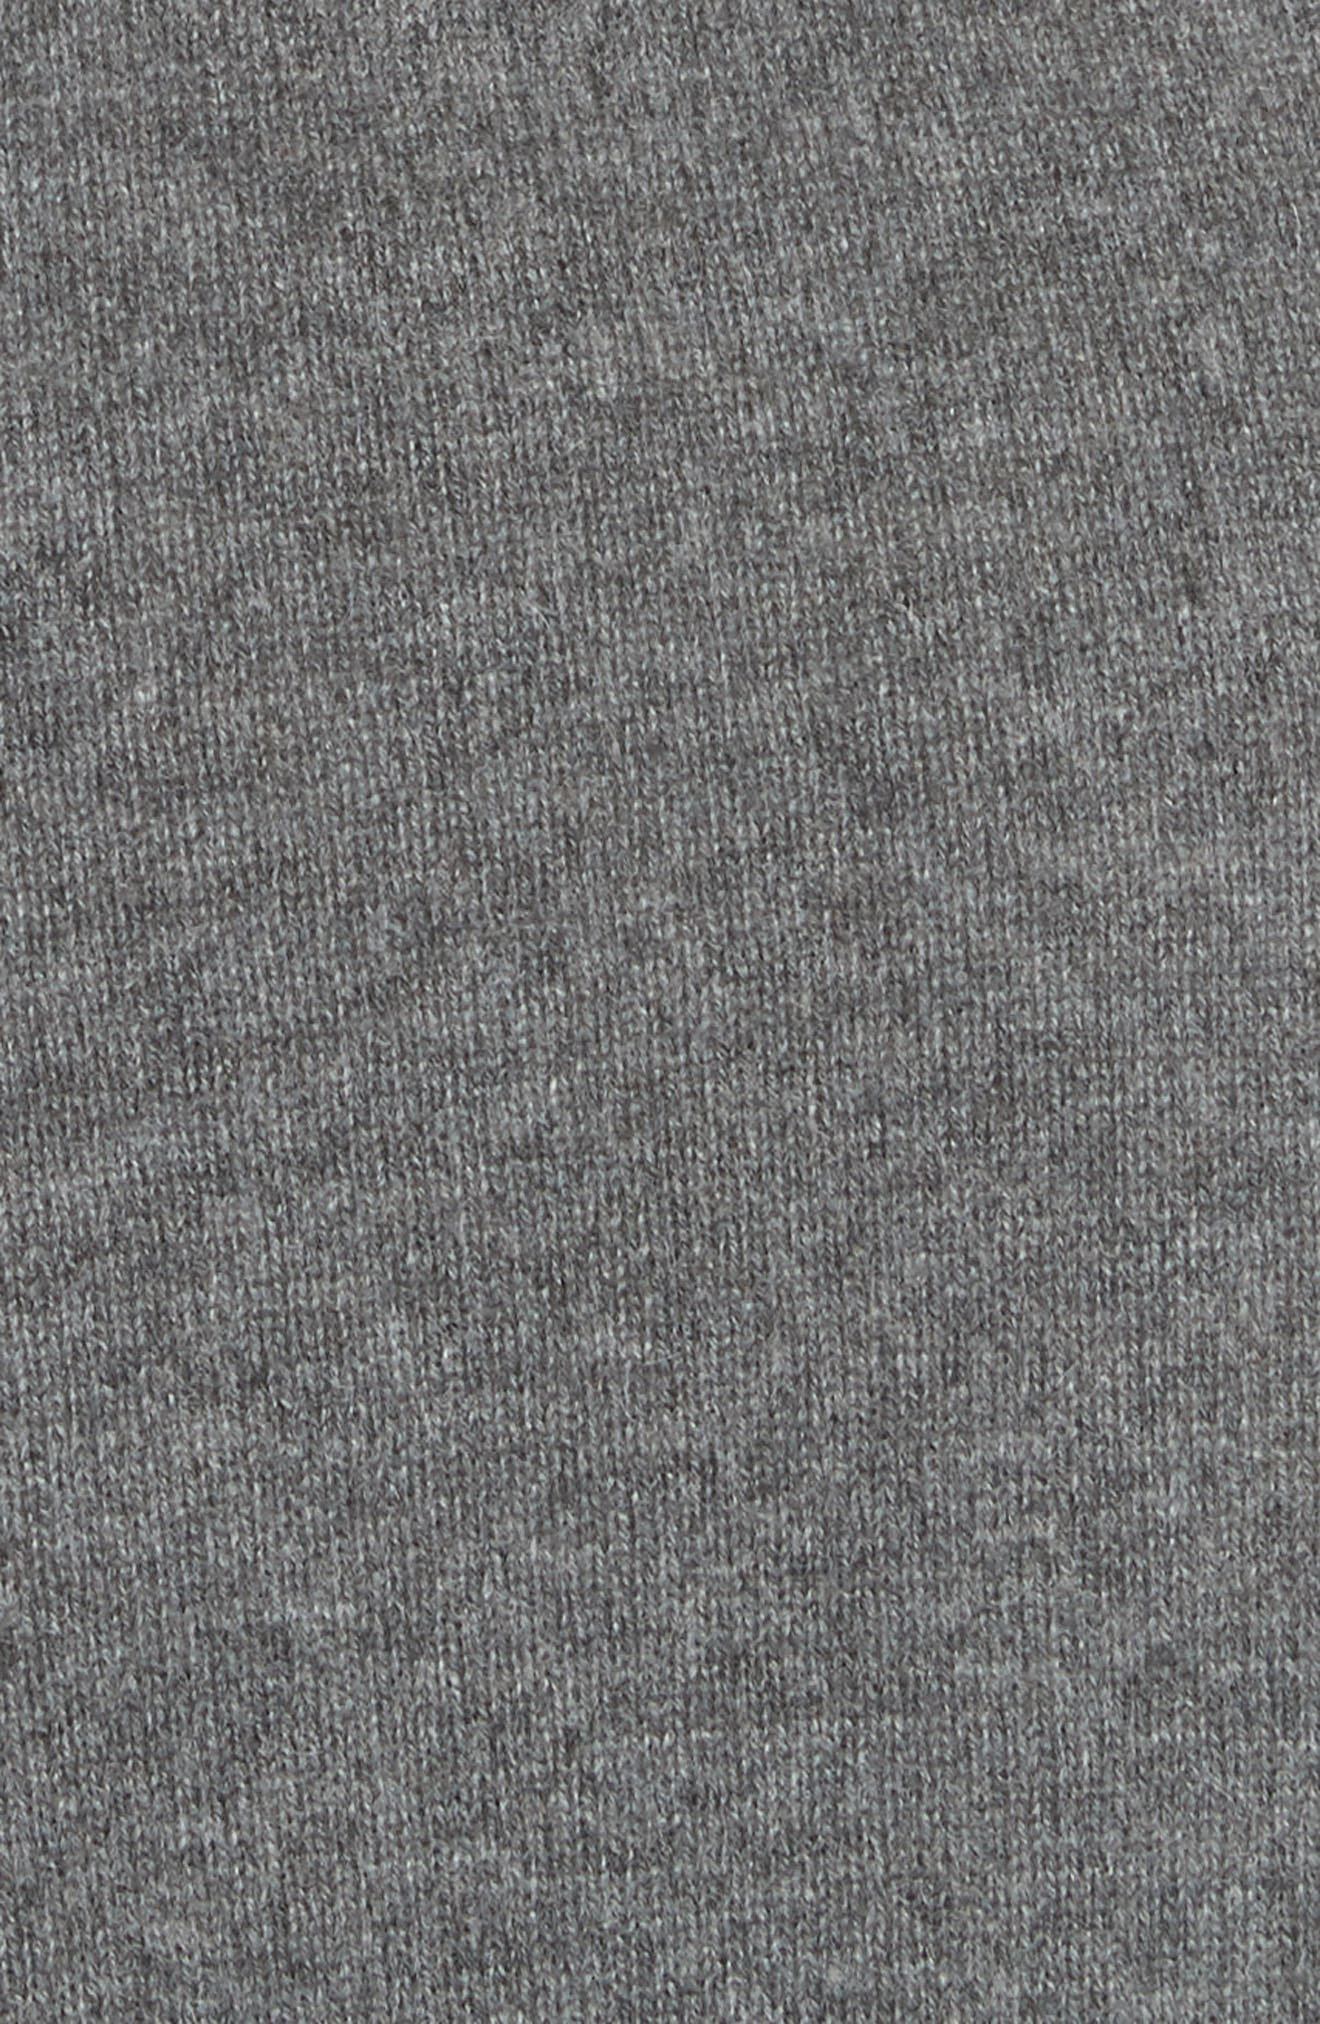 Diane Von Furstenberg Linda Cashmere Wrap Dress,                             Alternate thumbnail 5, color,                             Charcoal Melange